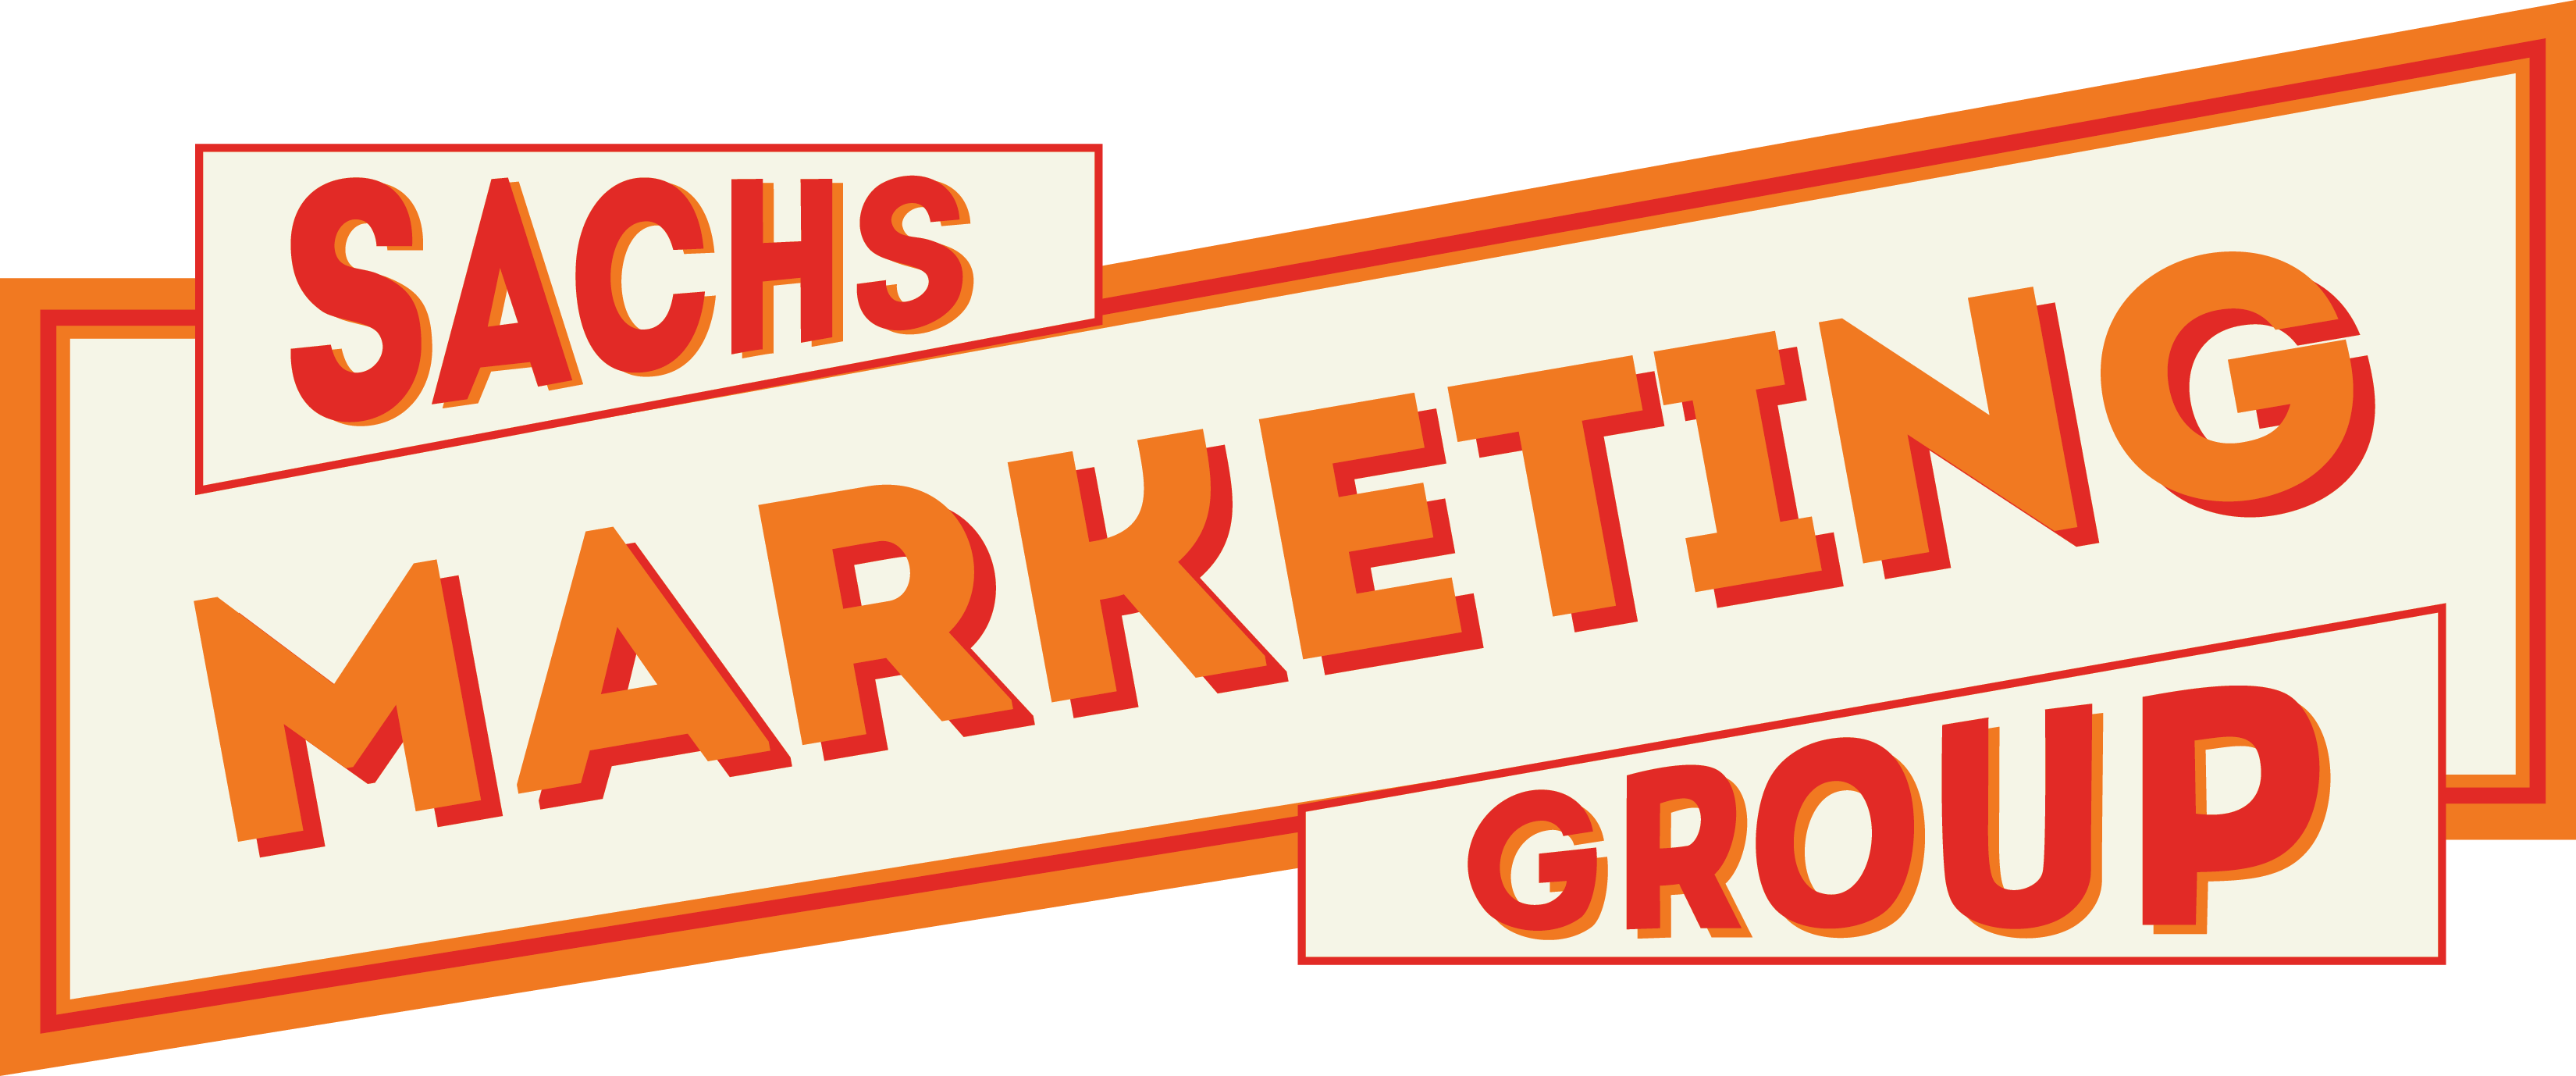 Sachs Marketing Group